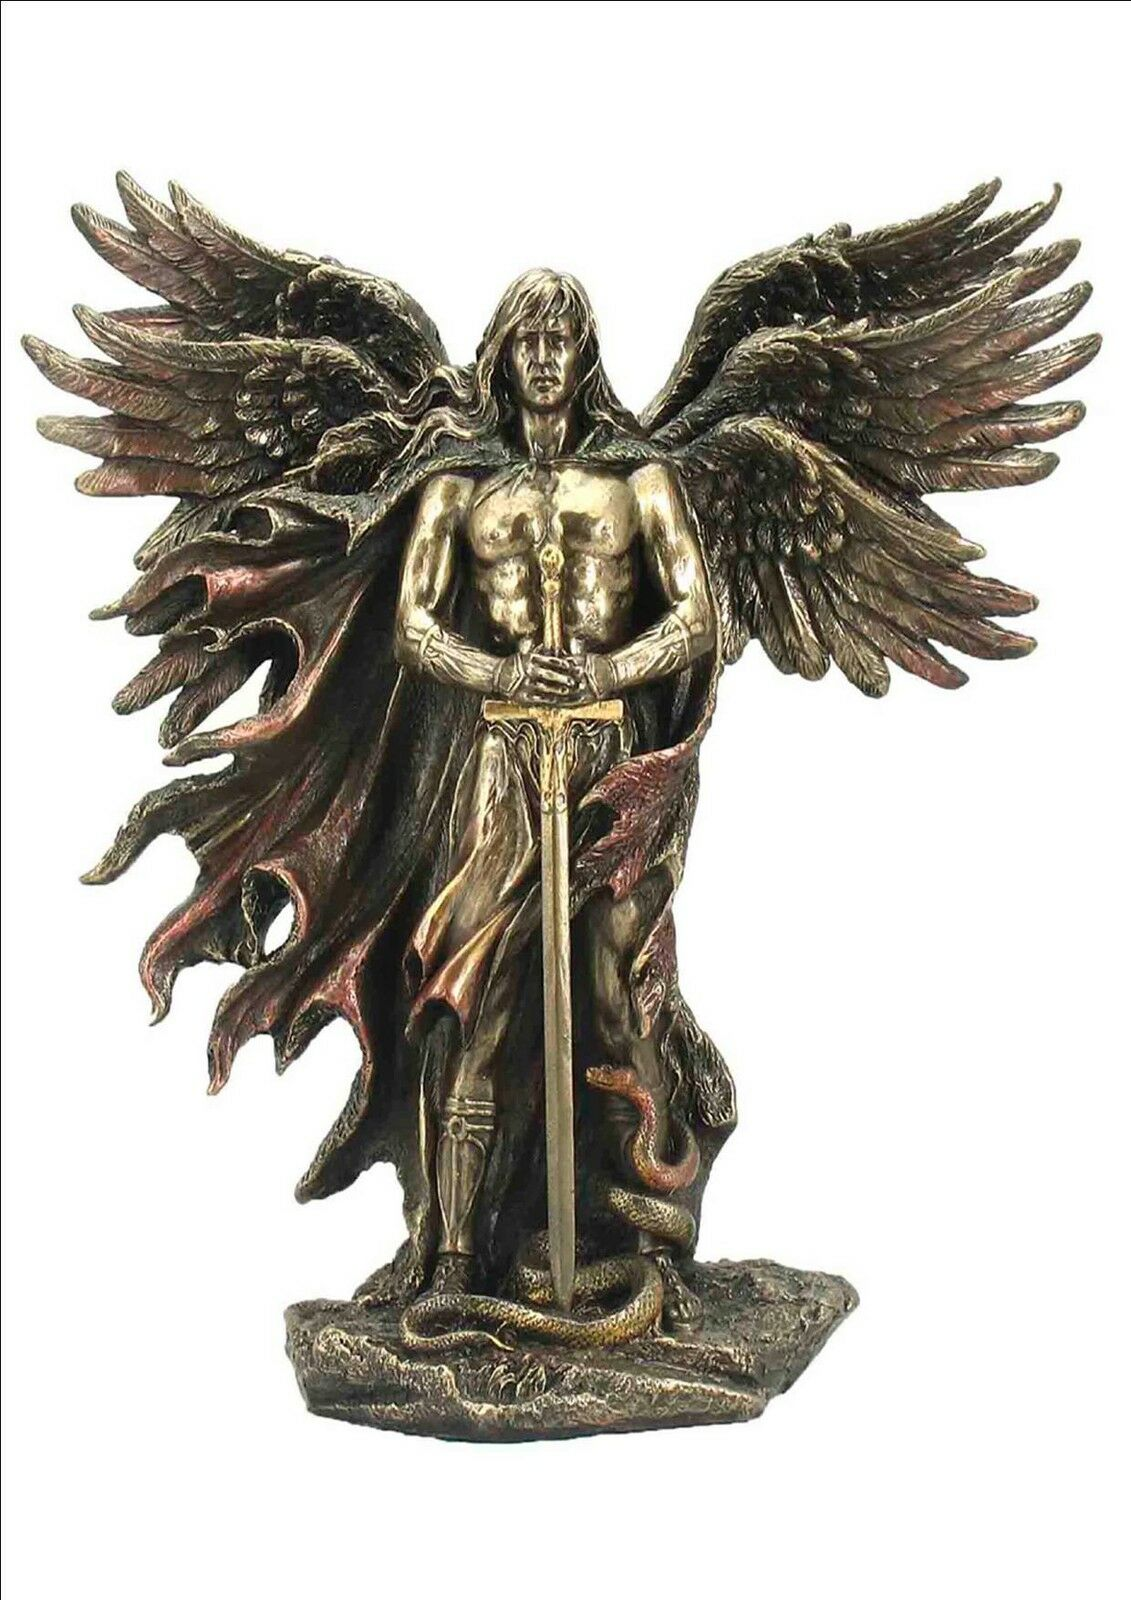 Erzengel Metatron König der Engel Figur Skulptur Statue bronziert 708-5976